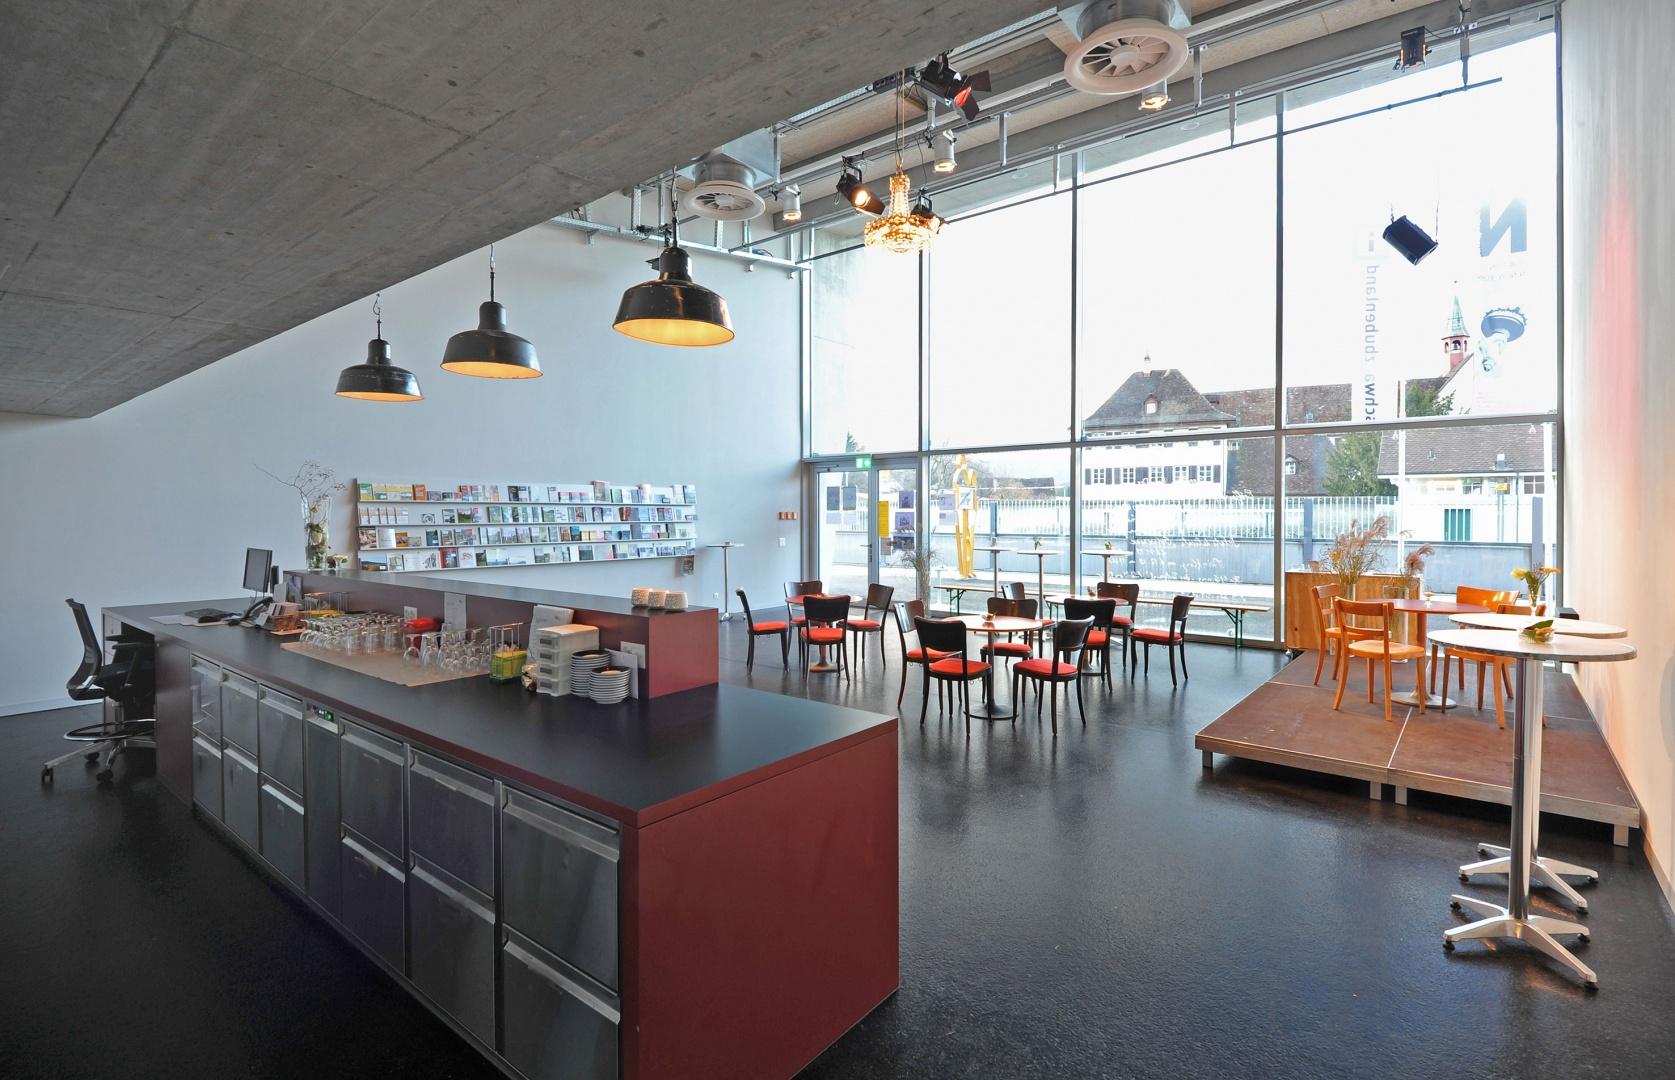 Café Neuestheater © Lili Kehl